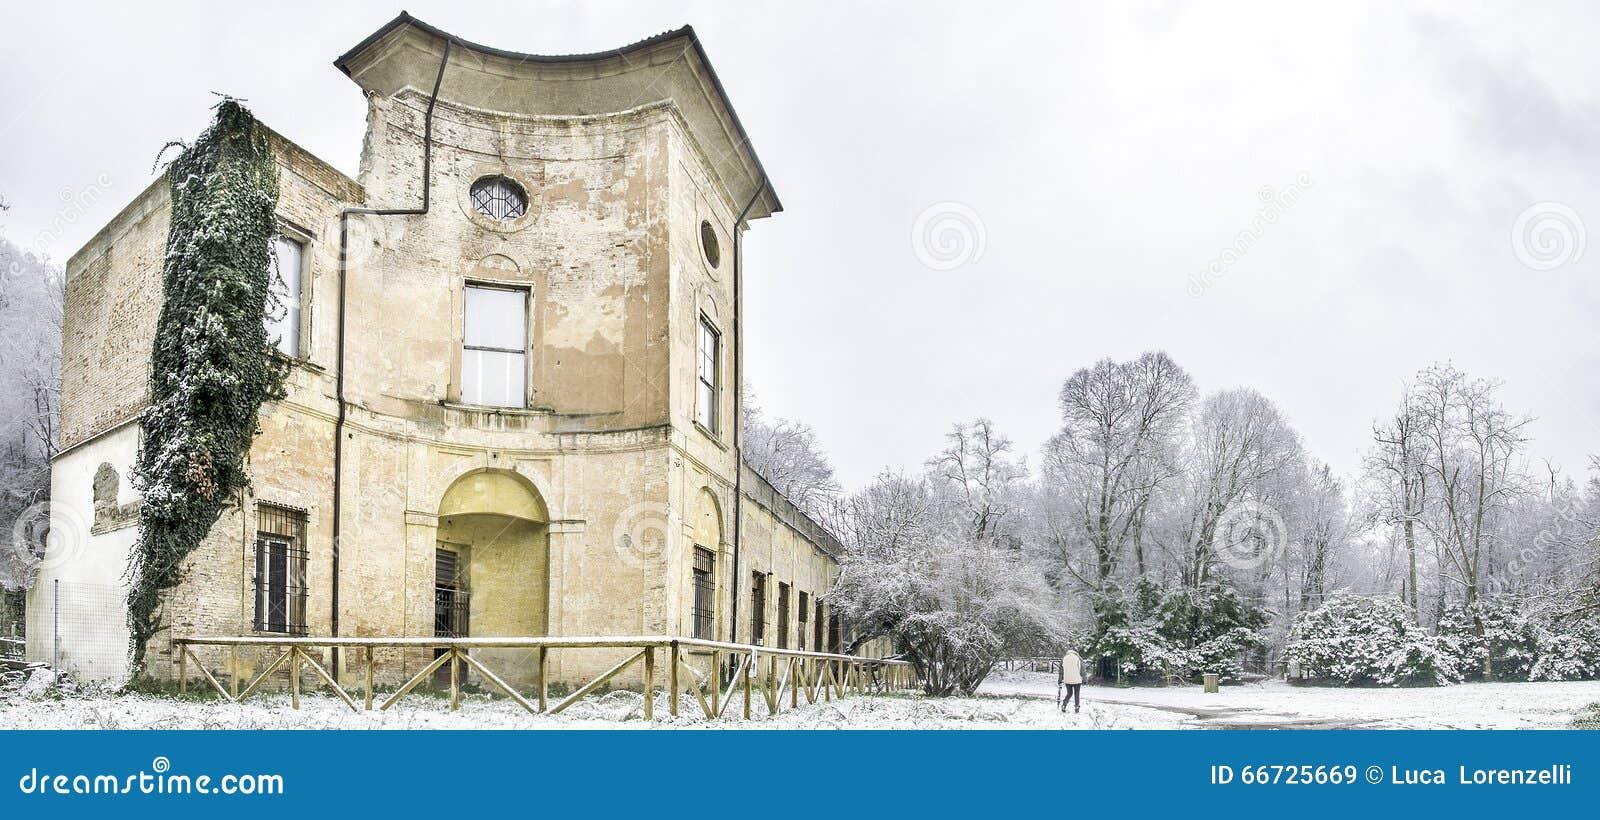 Bologna italy december 28 2014 villa sampieri talon for Casalecchio di reno bologna hotel